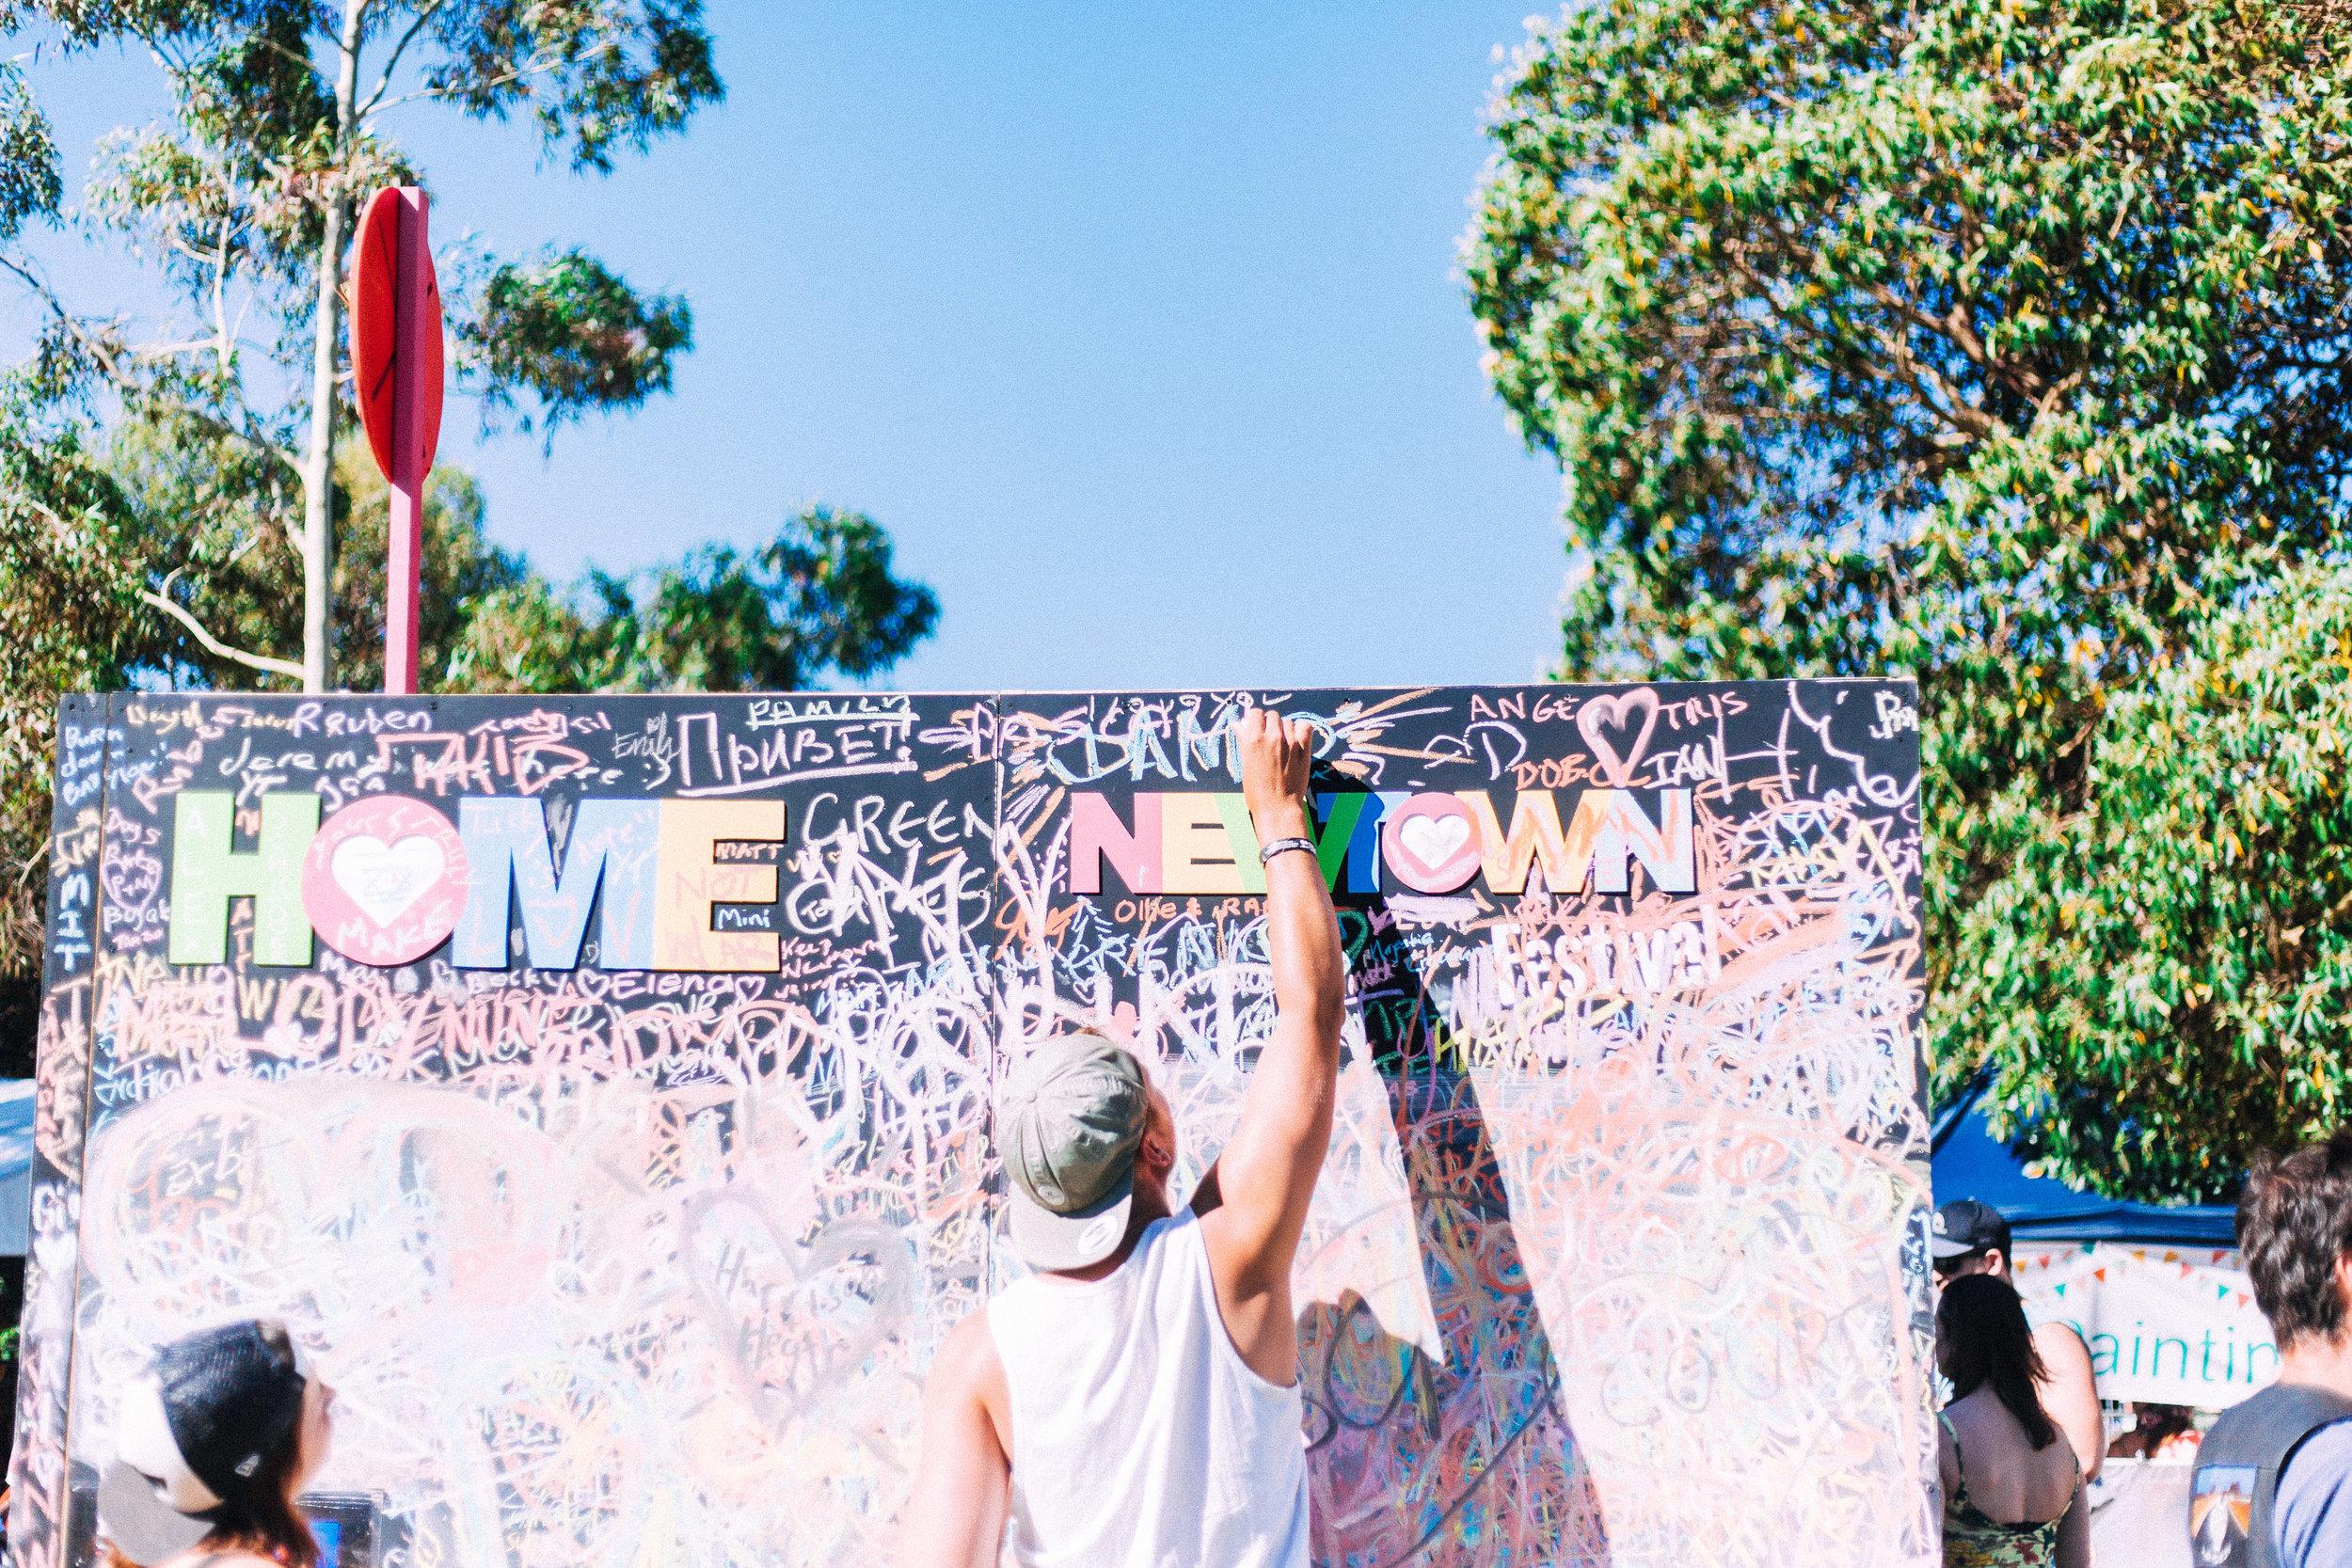 Newtown_Festival-8373.jpg